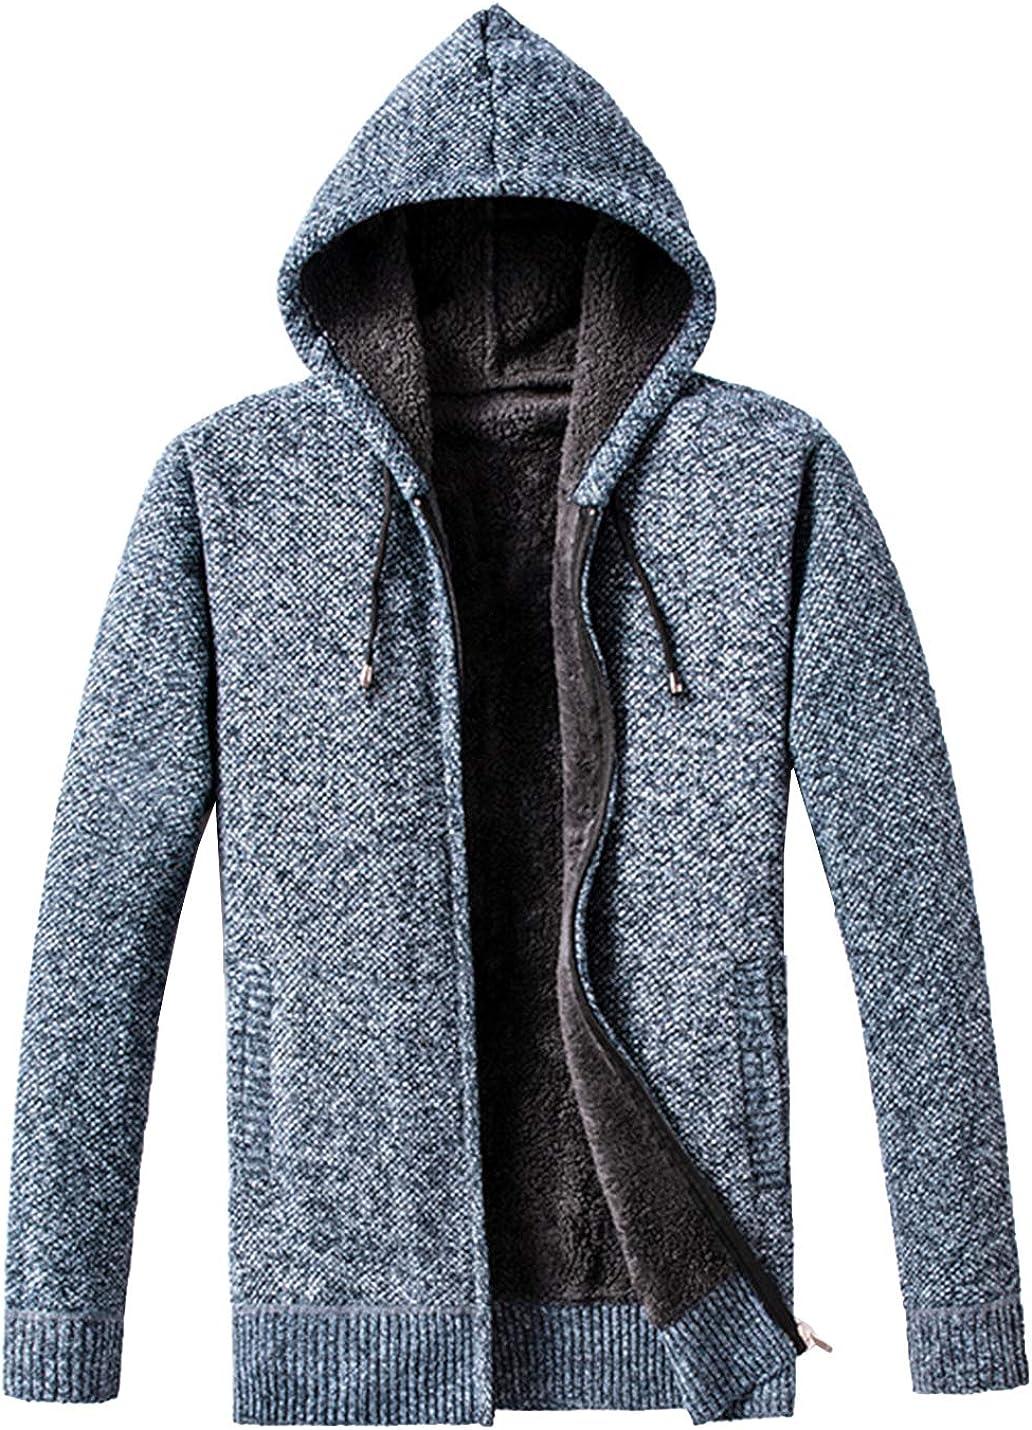 PEHMEA Men's Classic Zip Up Sherpa Fleece Lined Slim Fit Hooded Knitted Cardigans Sweaters Jackets